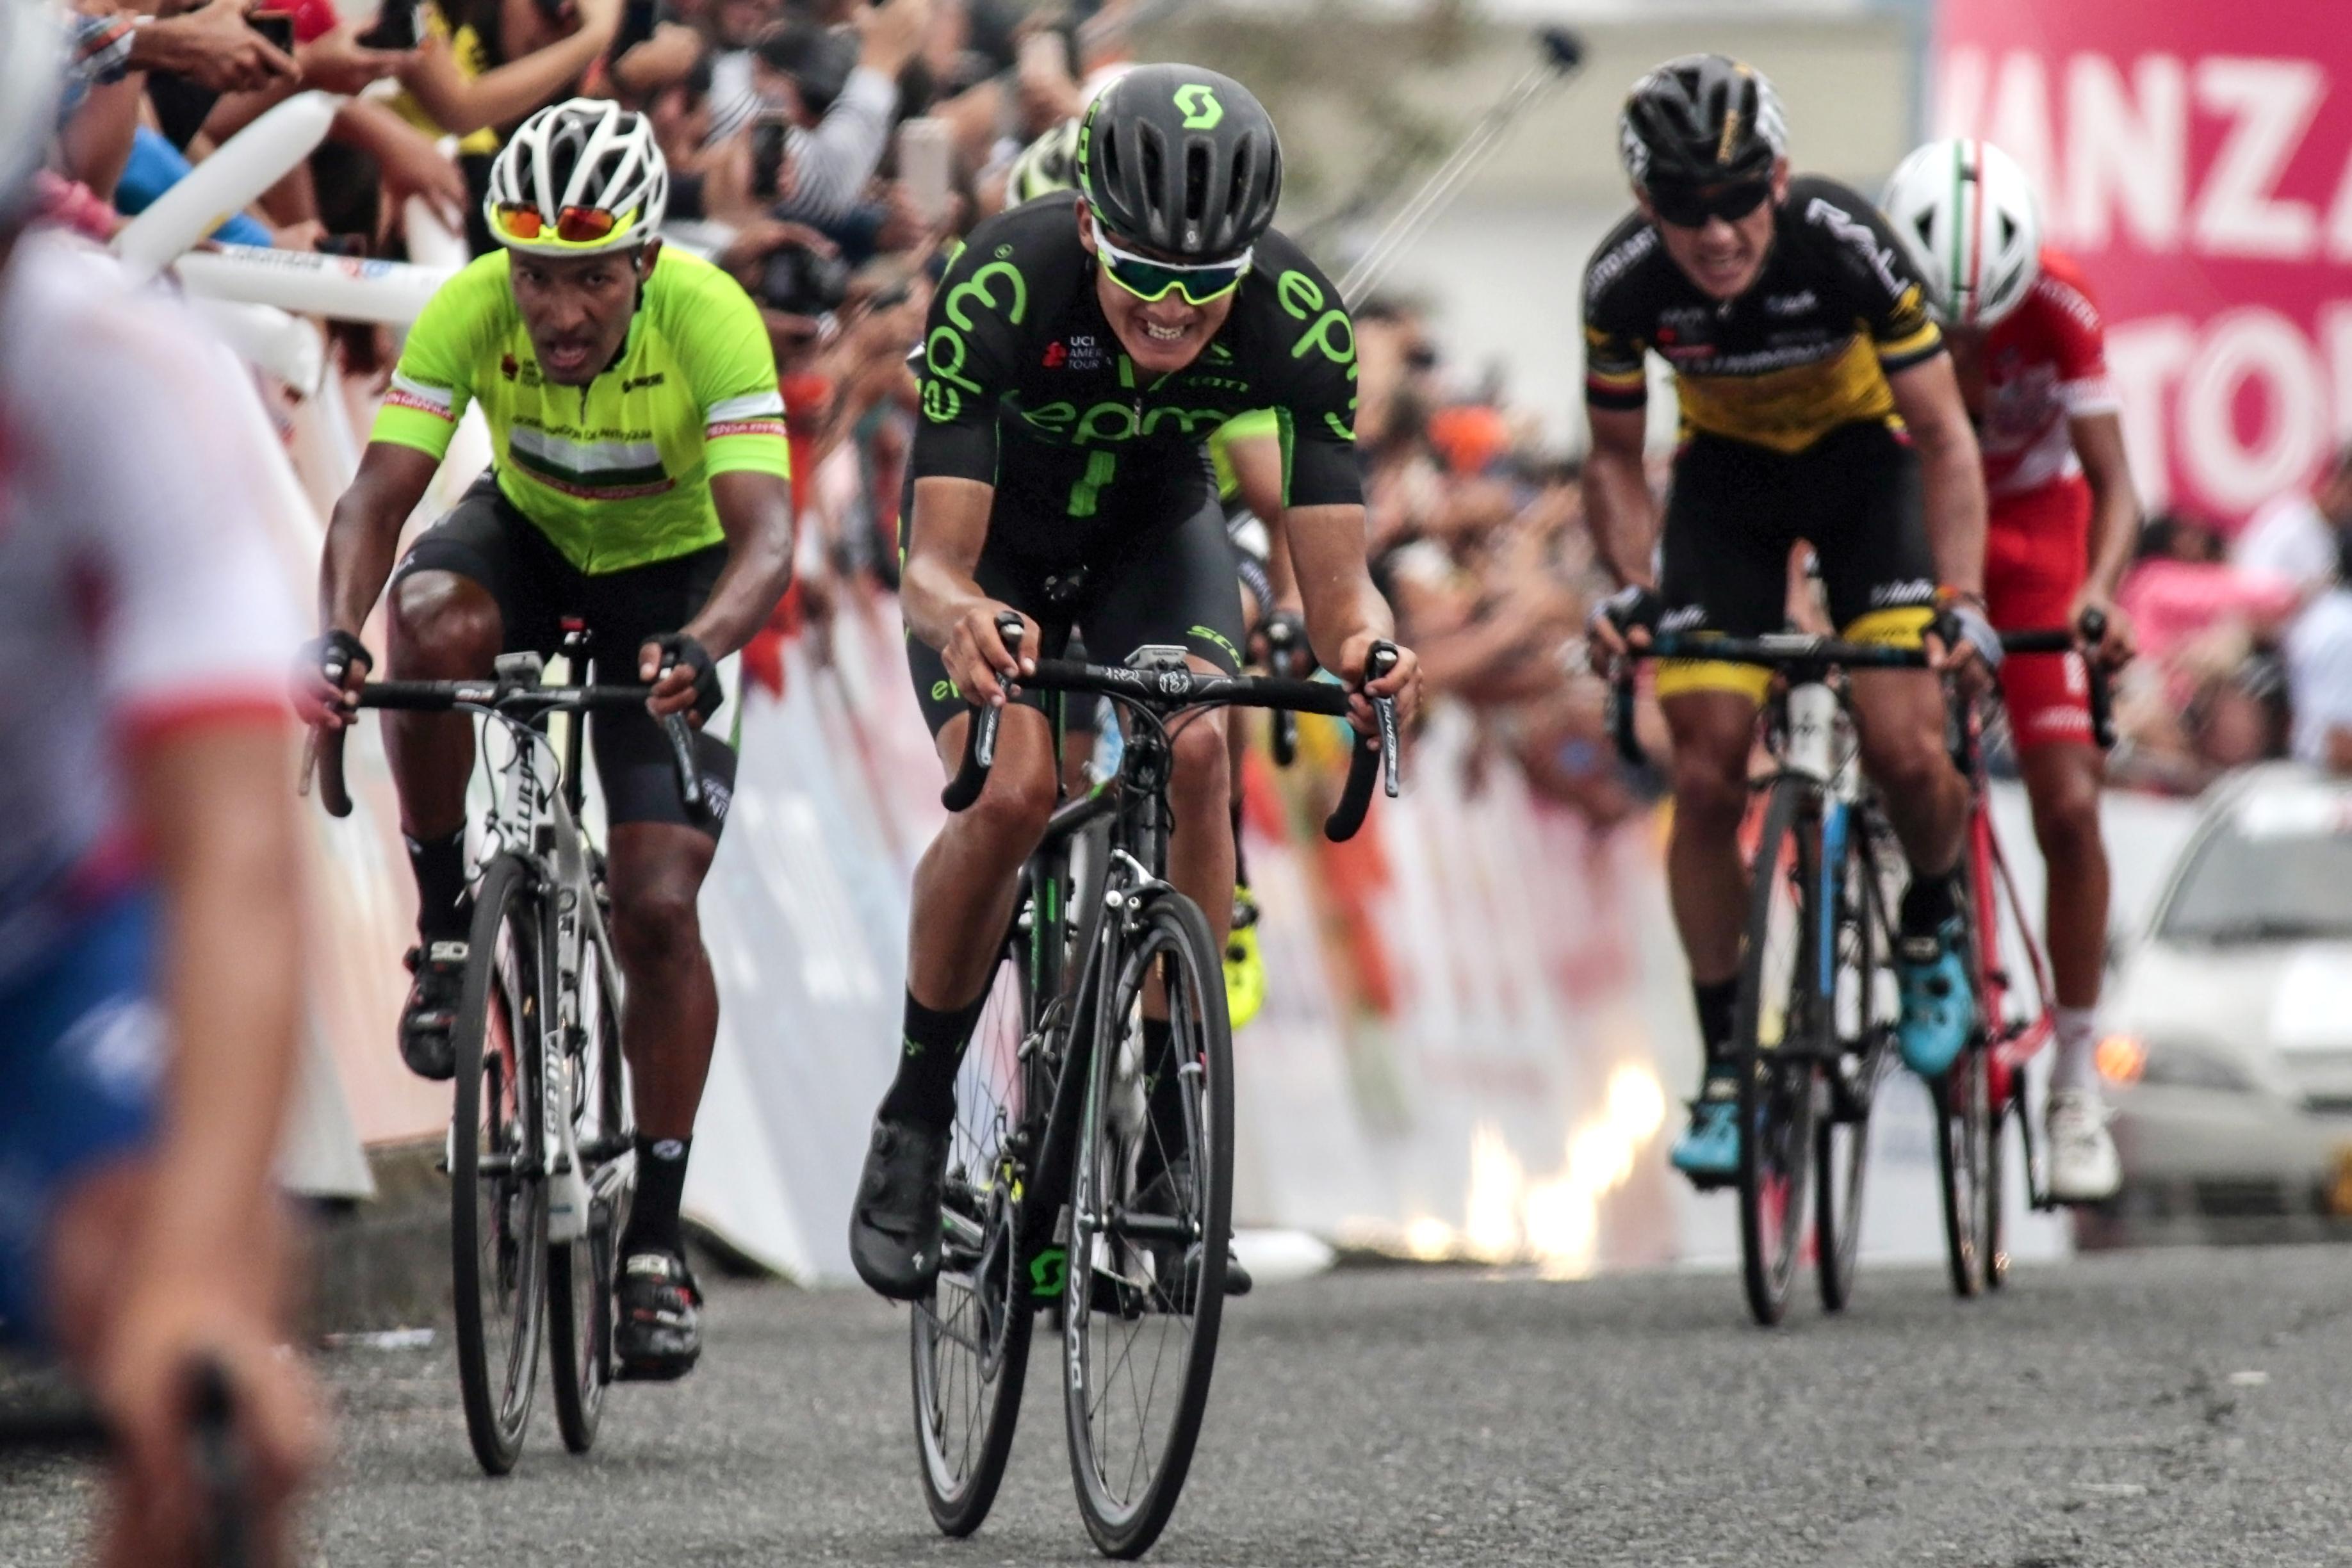 Oscar Sevilla was robbed in Bogota on a morning ride